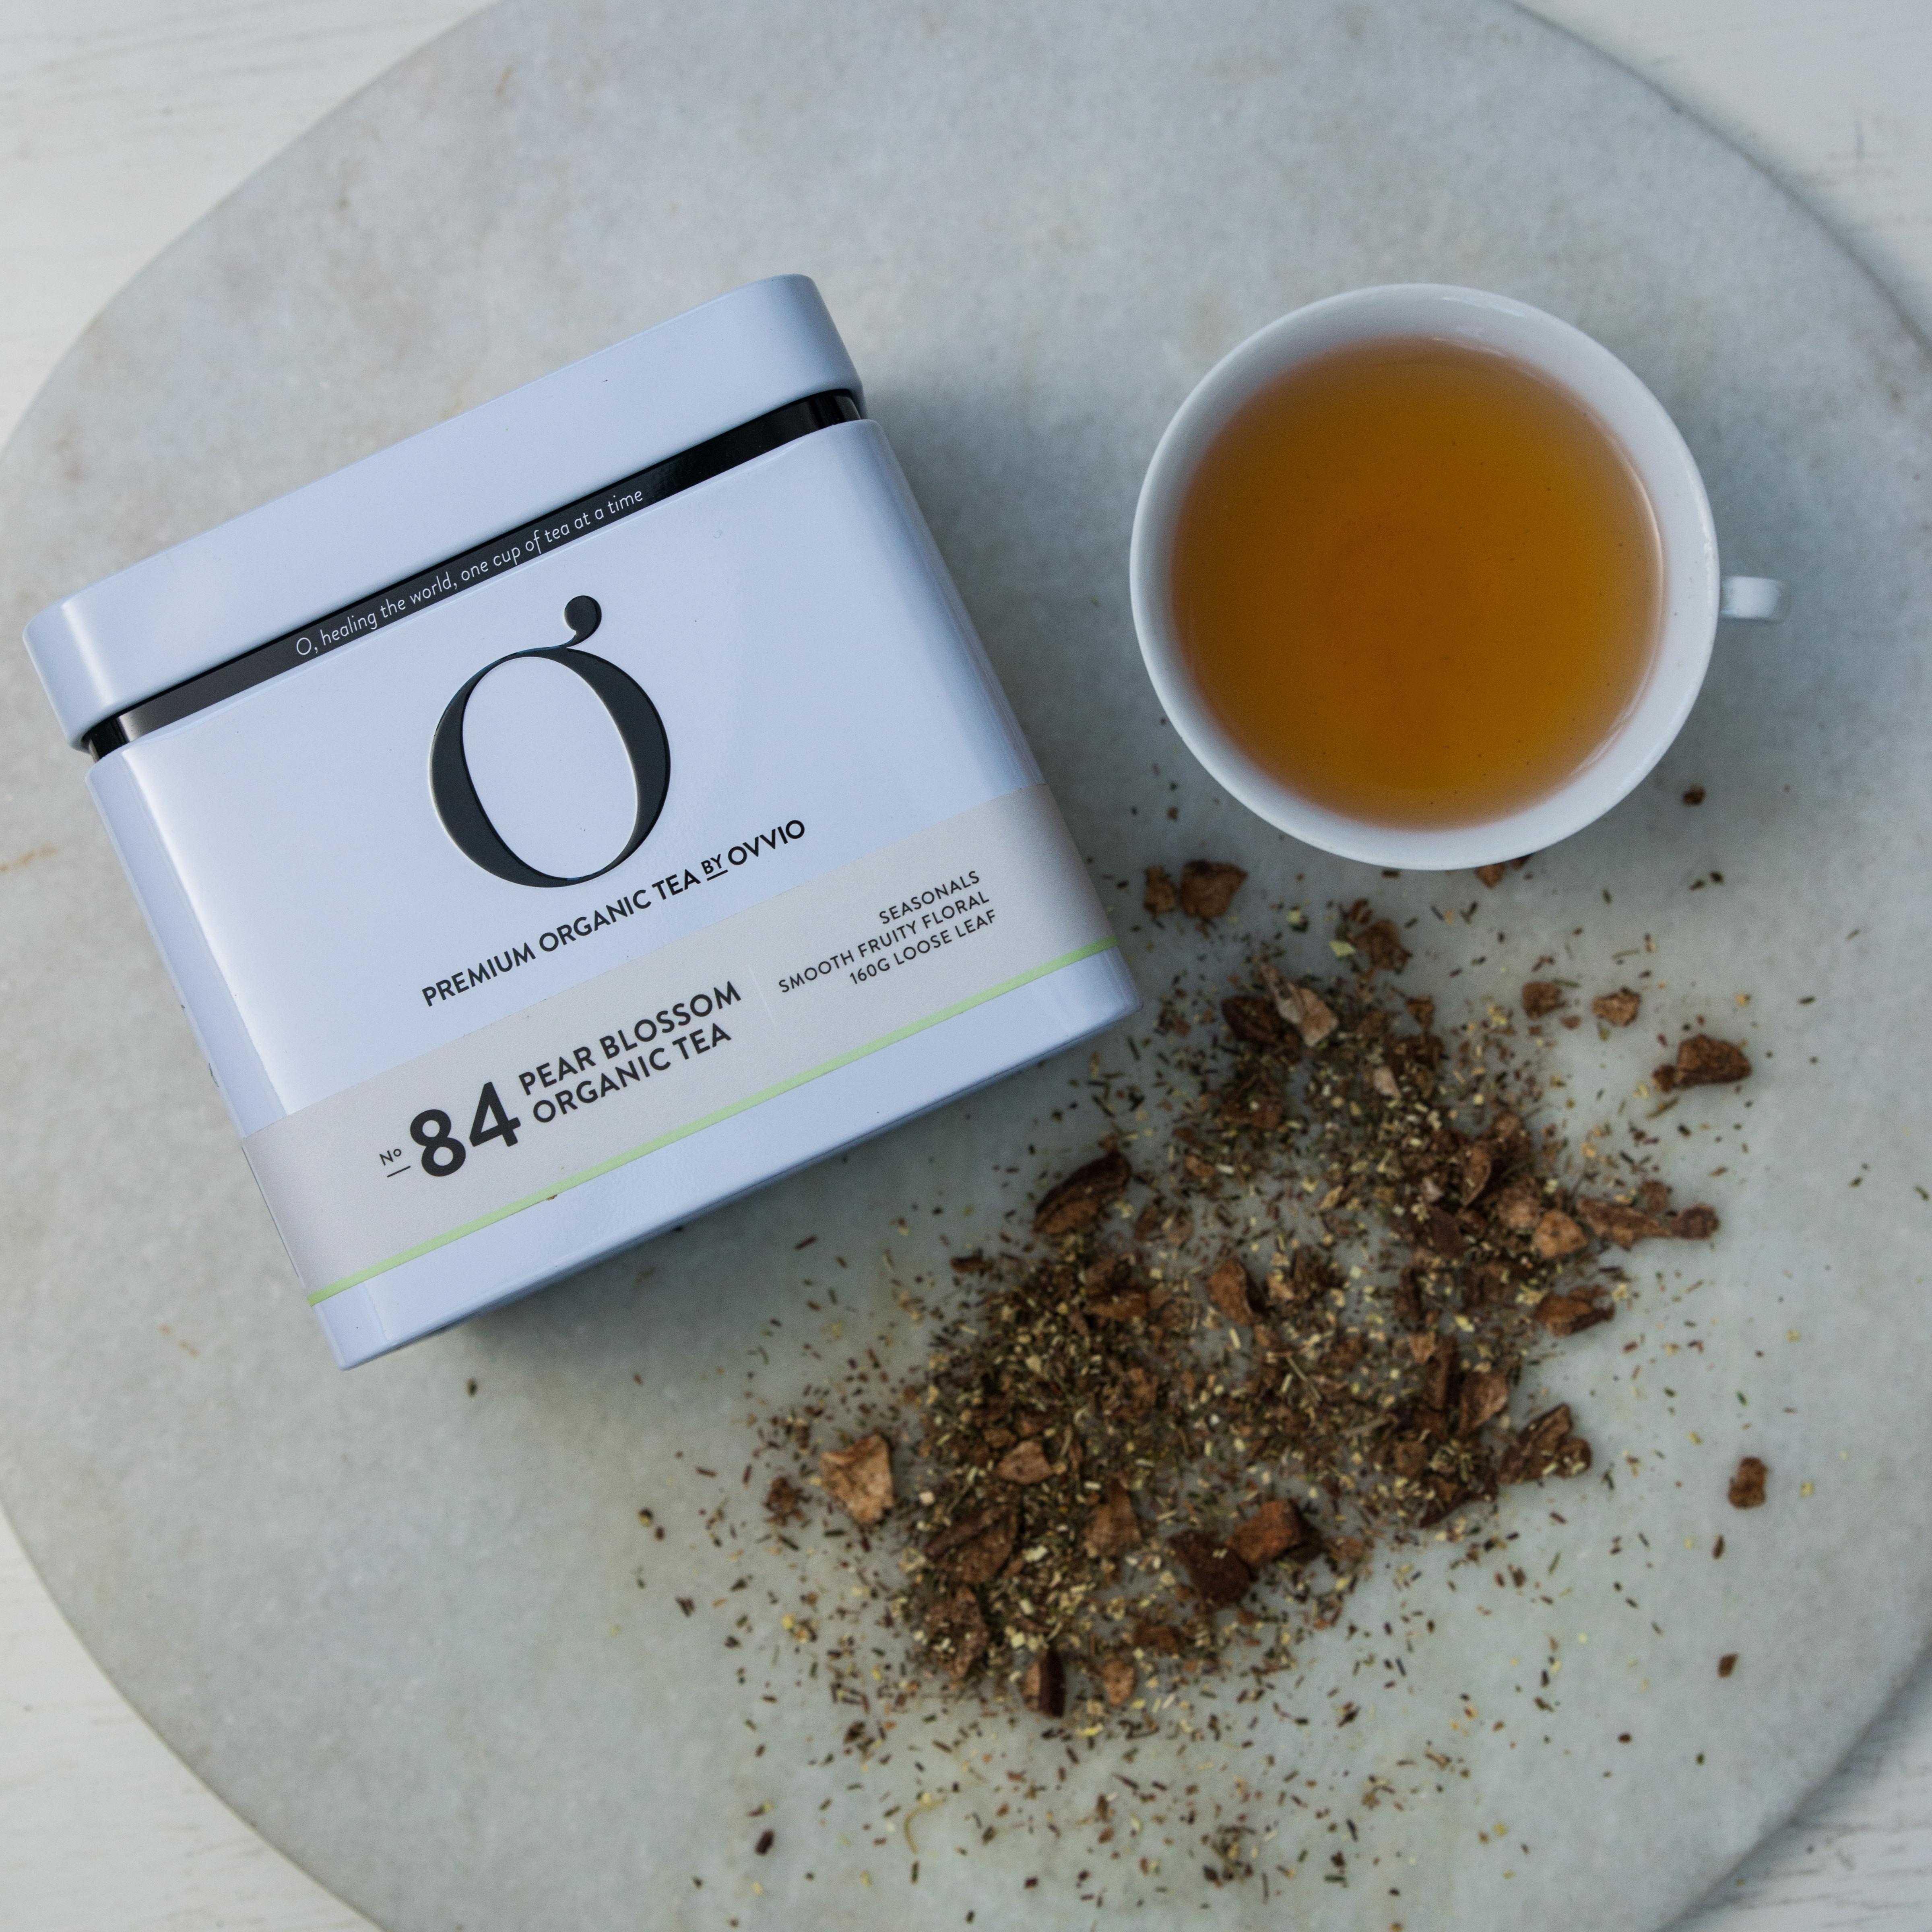 NEW No 84 Pear Blossom Organic Tea Tin by Ovvio Organics